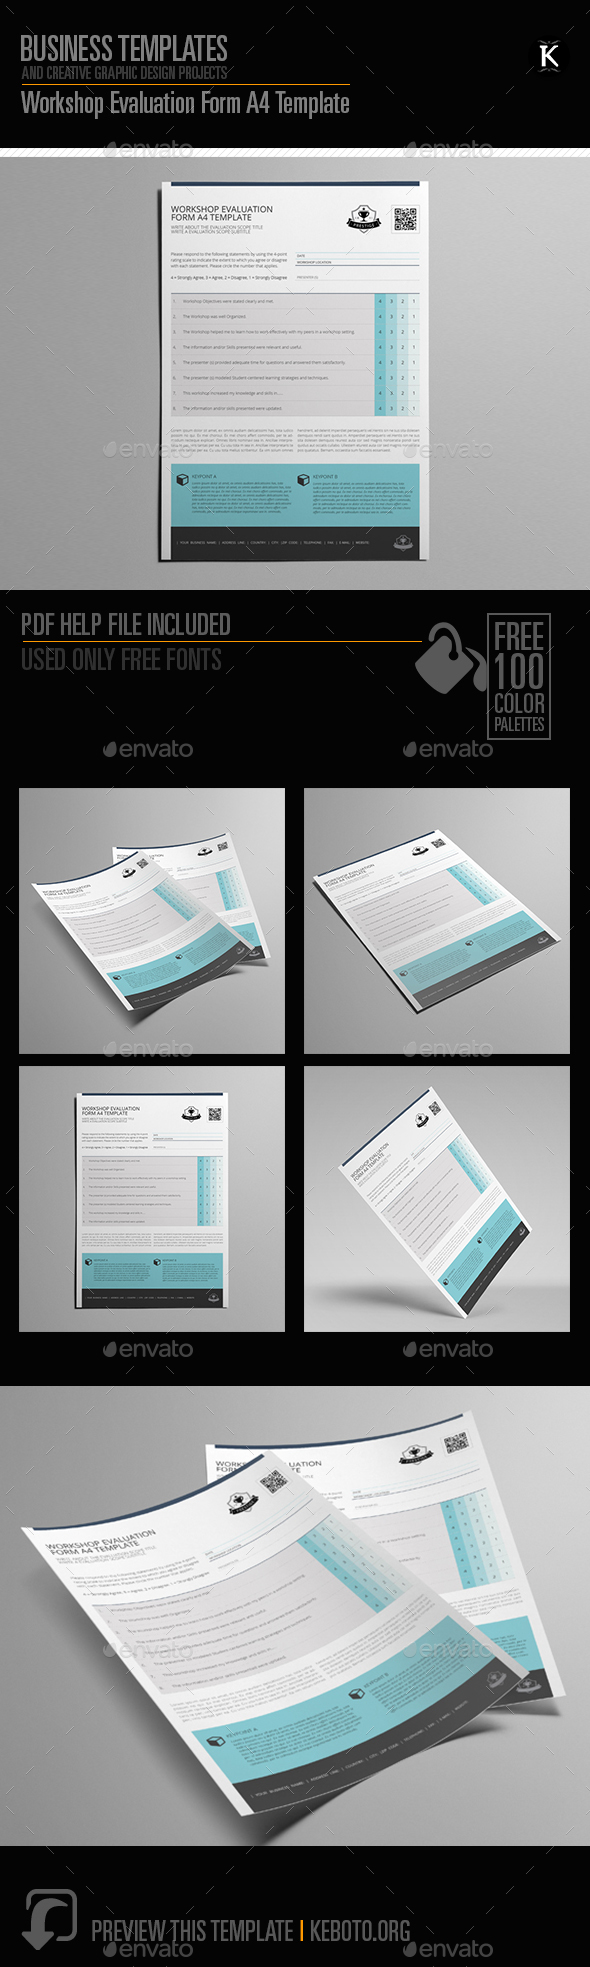 Workshop Evaluation Form A4 Template - Miscellaneous Print Templates